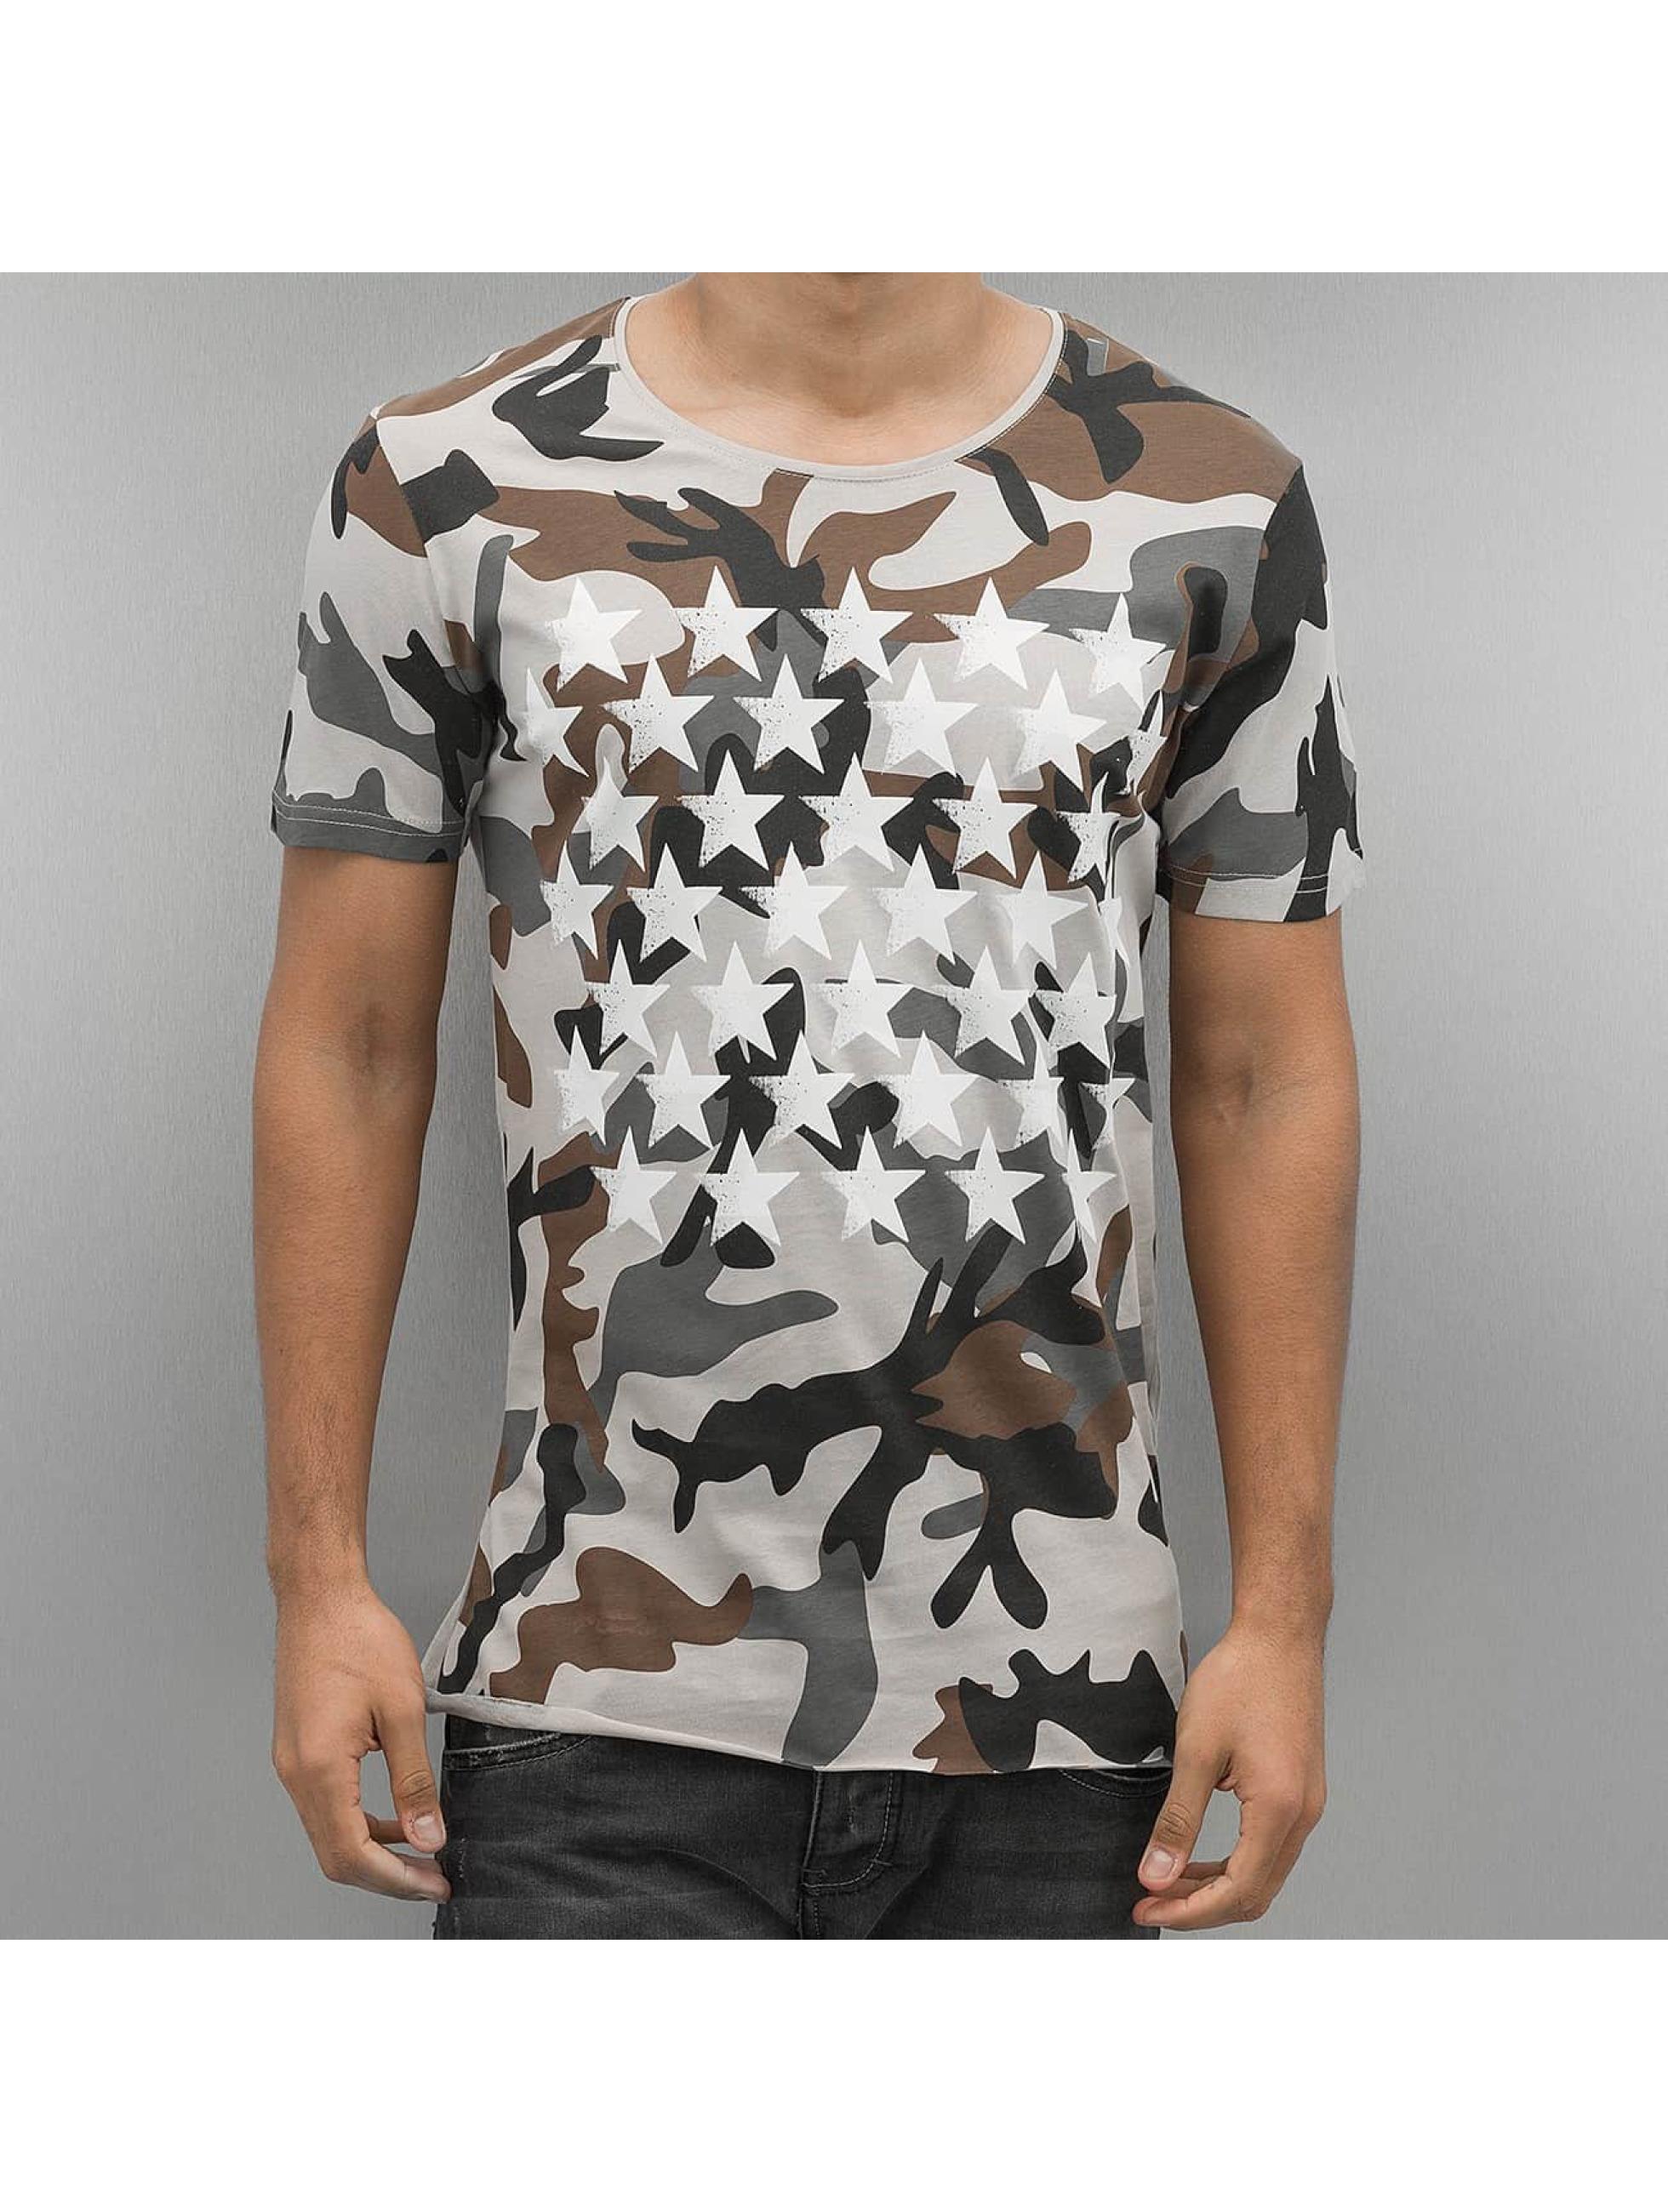 2Y T-Shirt Camo Stars beige